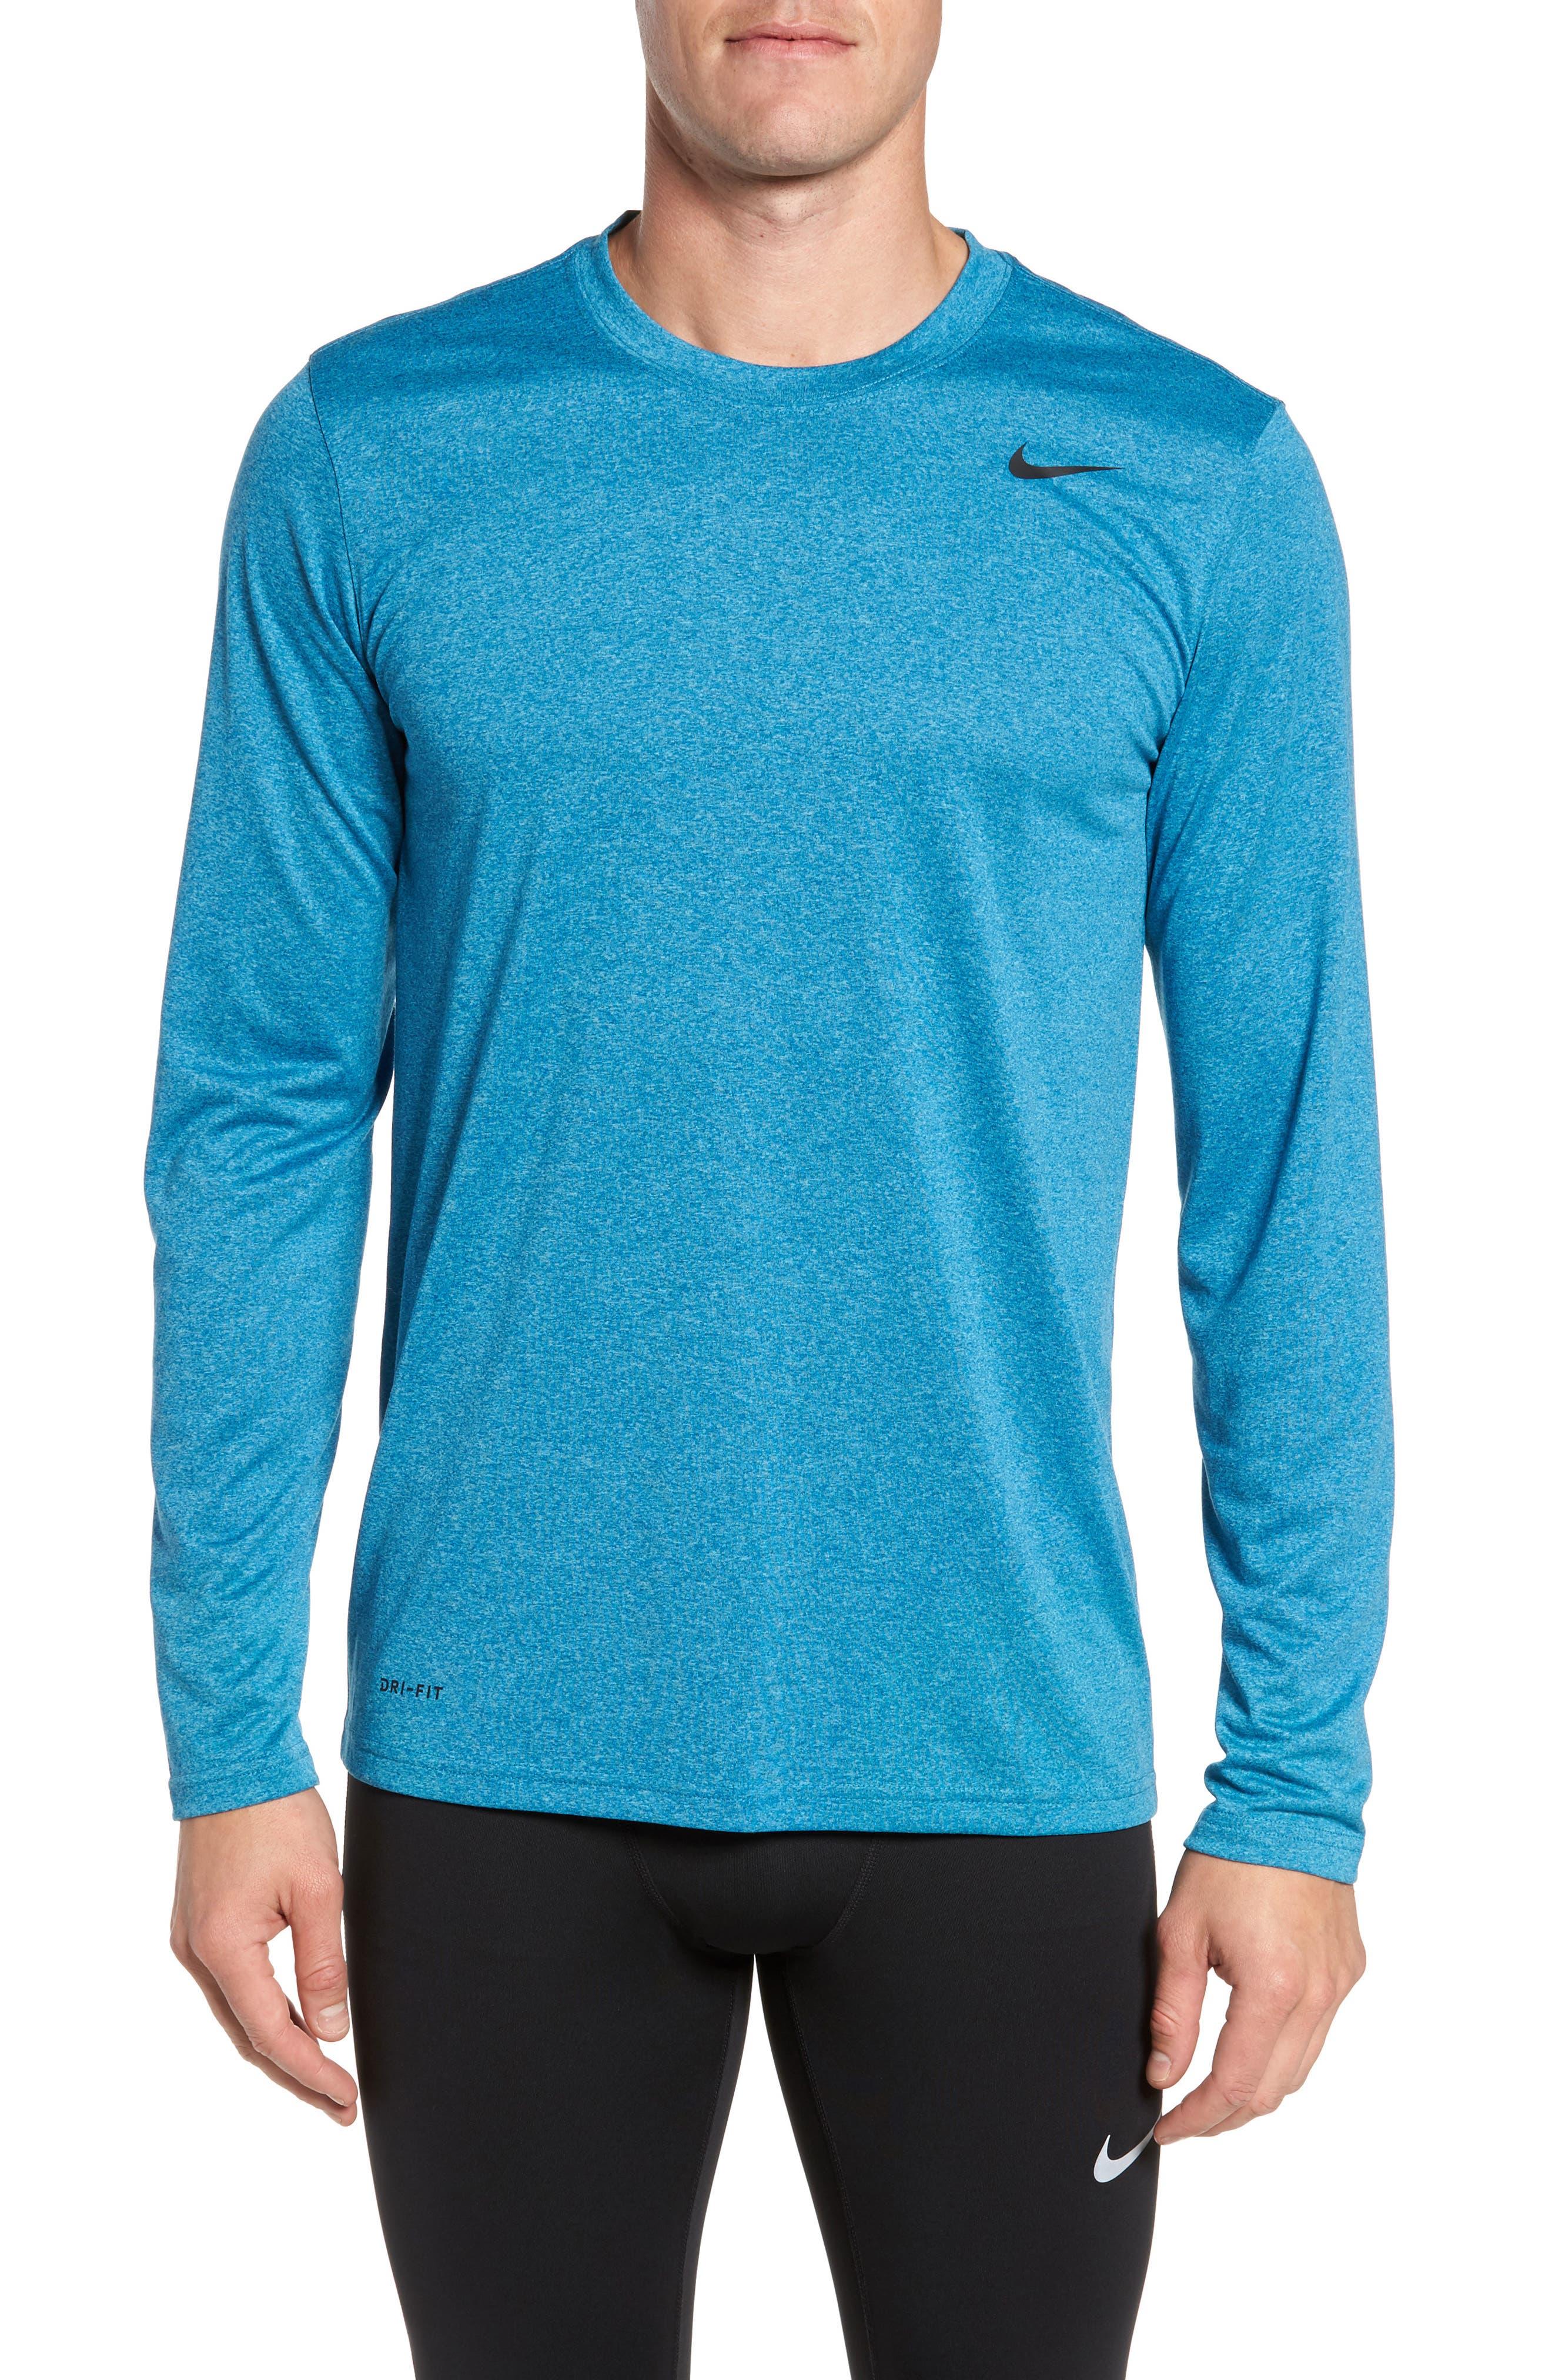 Alternate Image 1 Selected - Nike 'Legend 2.0' Long Sleeve Dri-FIT Training T-Shirt